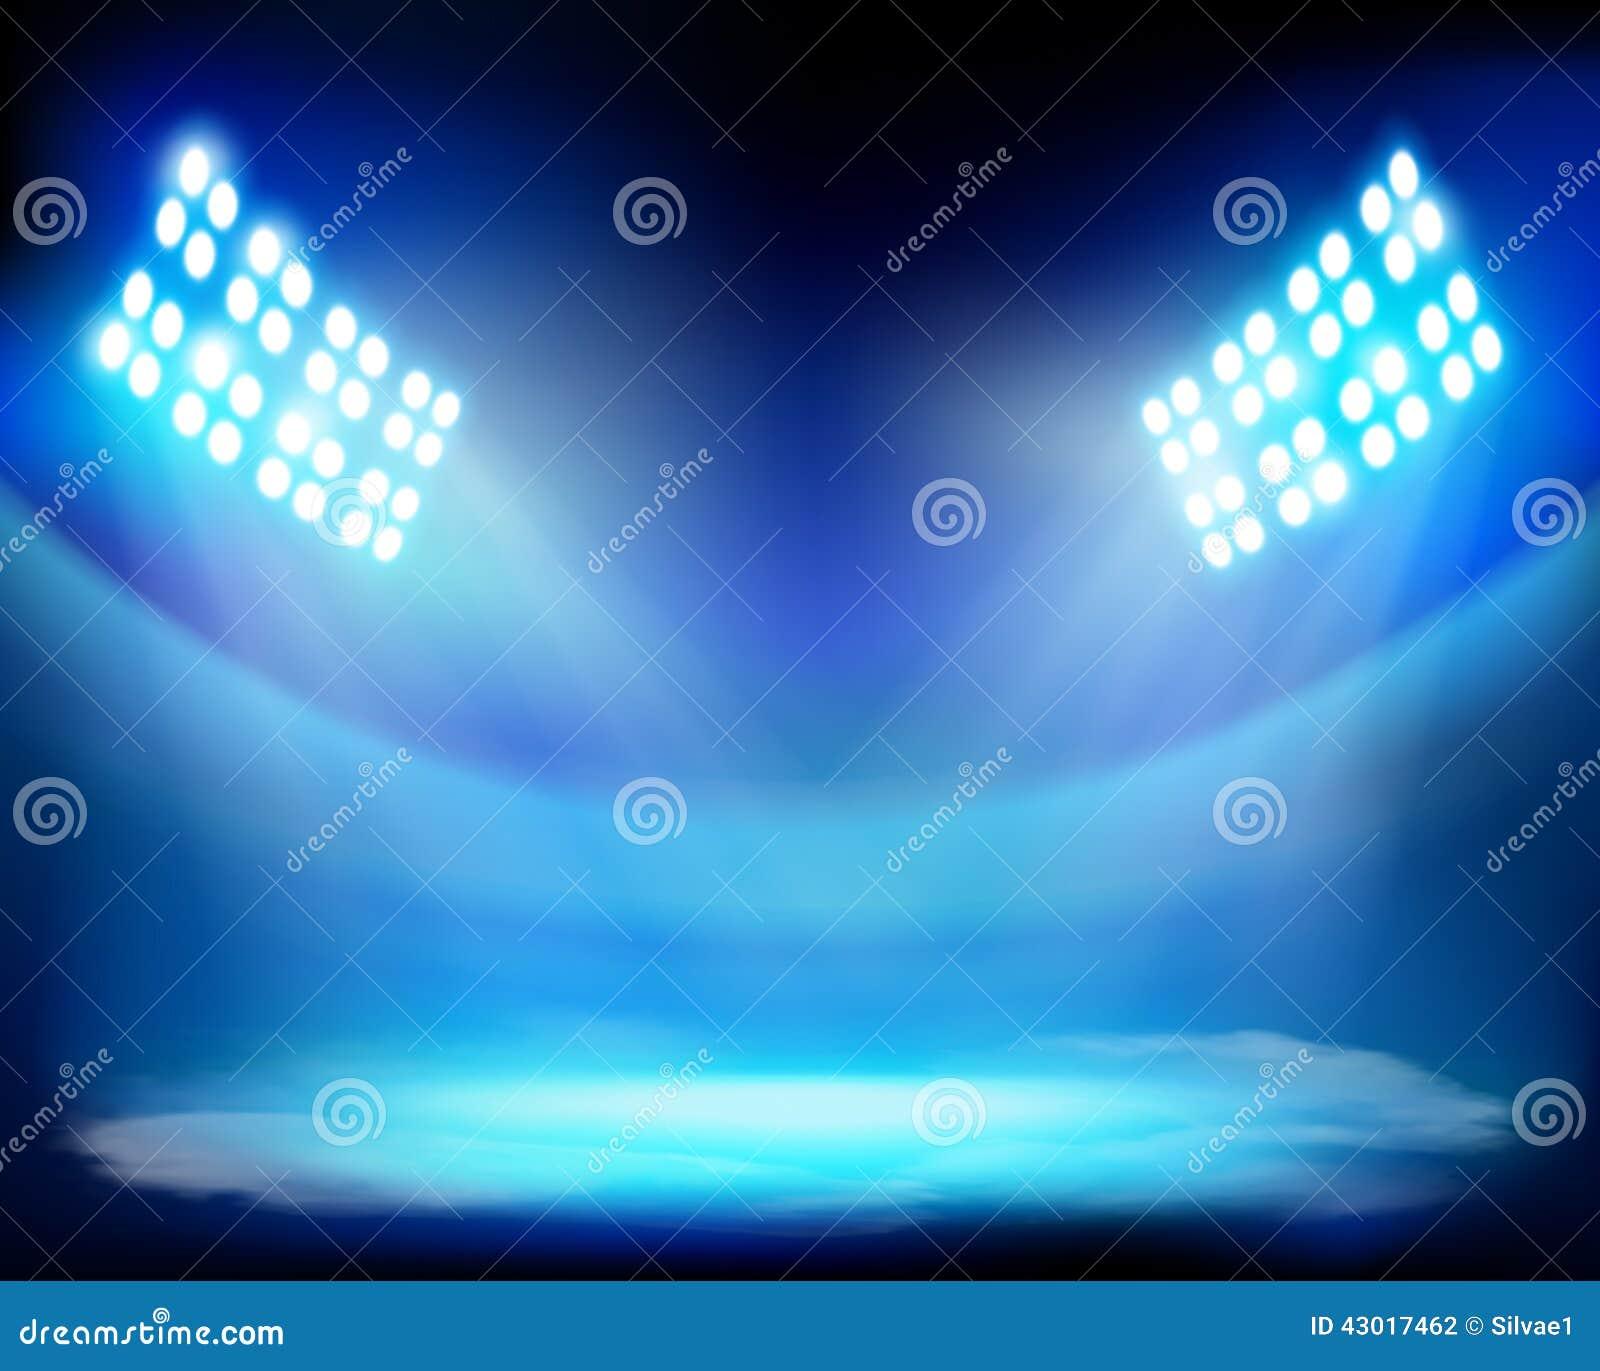 Stadium Lights Svg: Show On The Stadium. Vector Illustration. Stock Vector